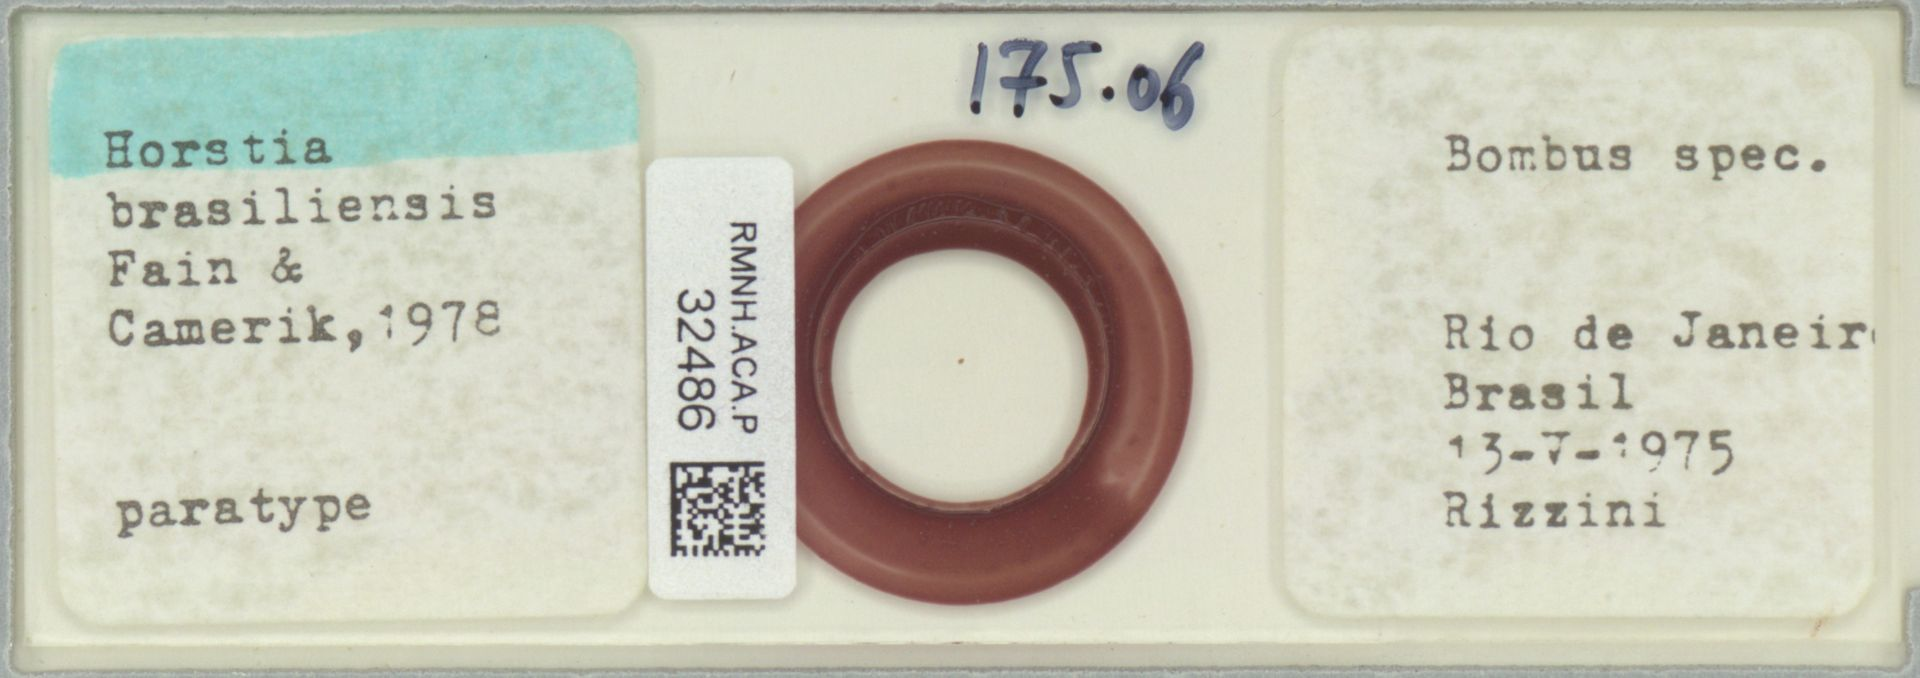 RMNH.ACA.P.32486 | Horstia brasiliensis Fain & Camerik 1978